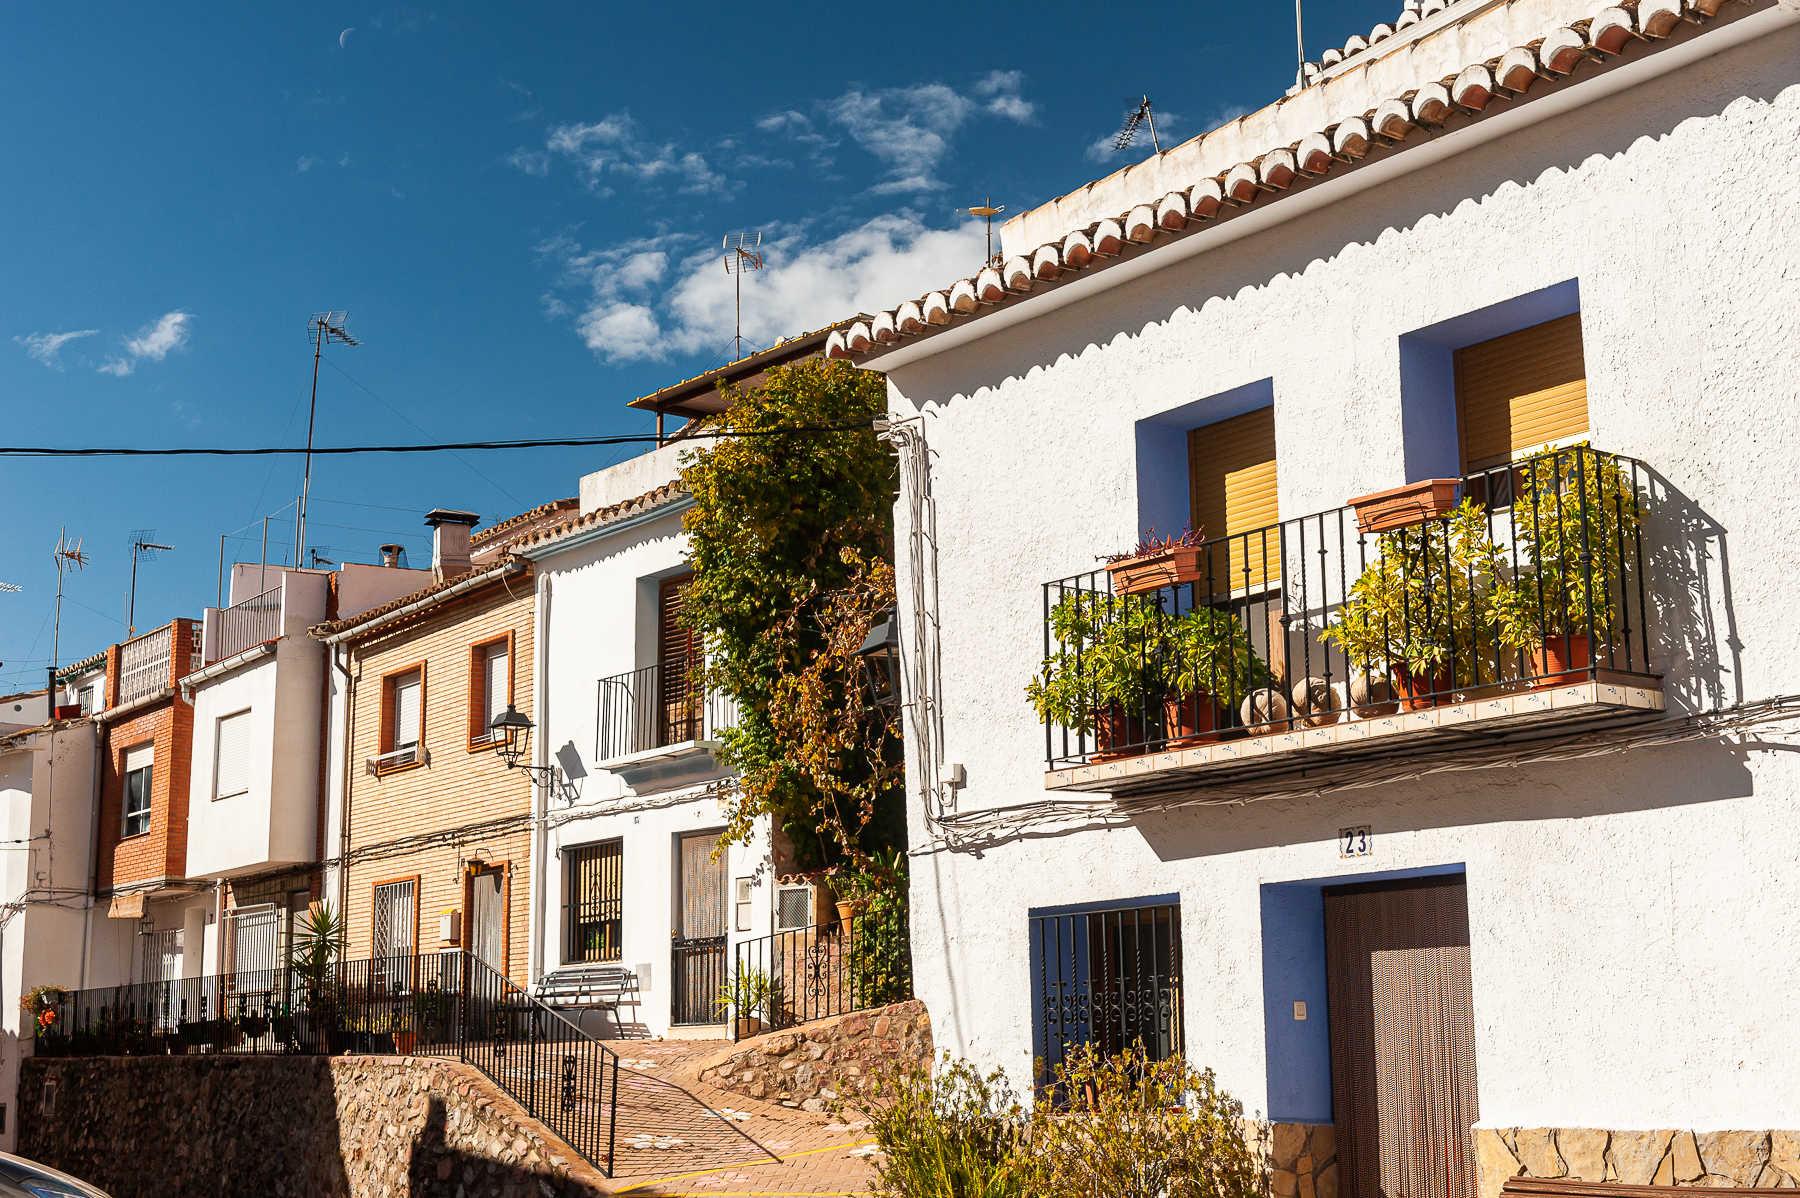 https://multimedia.comunitatvalenciana.com/52C505CC525544D59D0EEB2CB246FFCB/img/61B7E298E0B84BF8BB4F7C9859B8438B/2027-Almedijar-Pueblo-0195.jpg?responsive